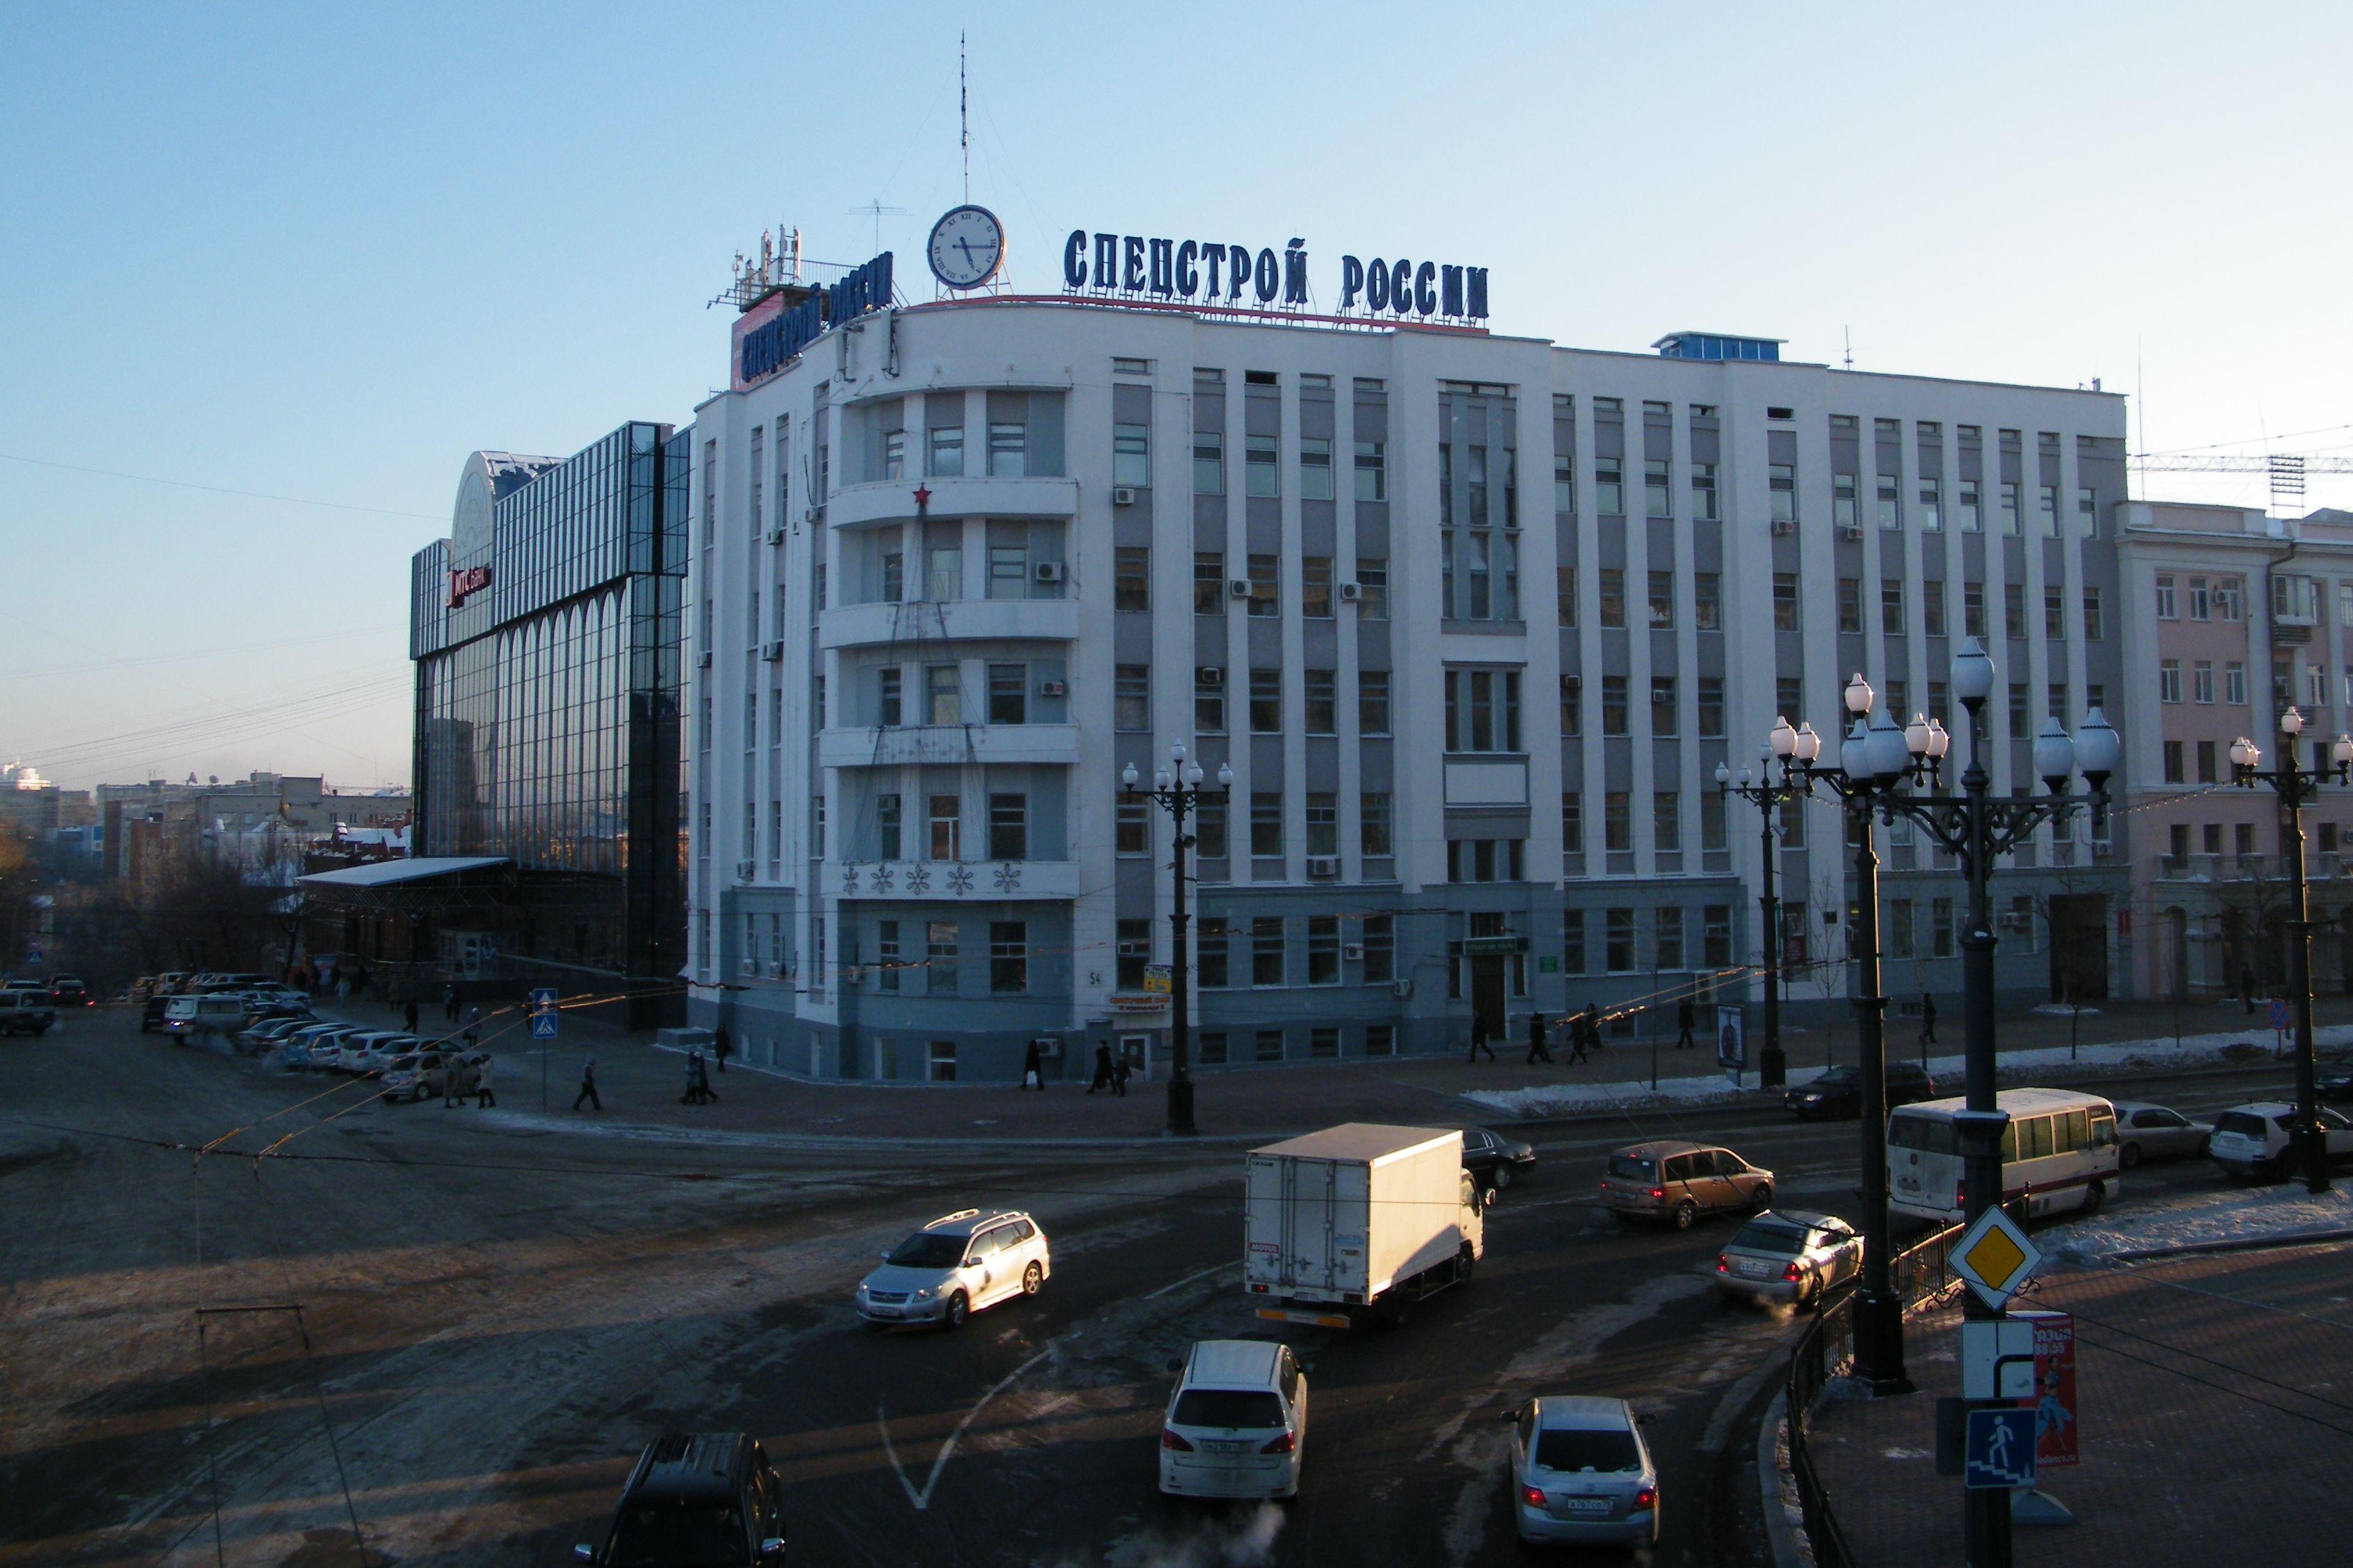 Ленинградская областная больница на луначарского д.45